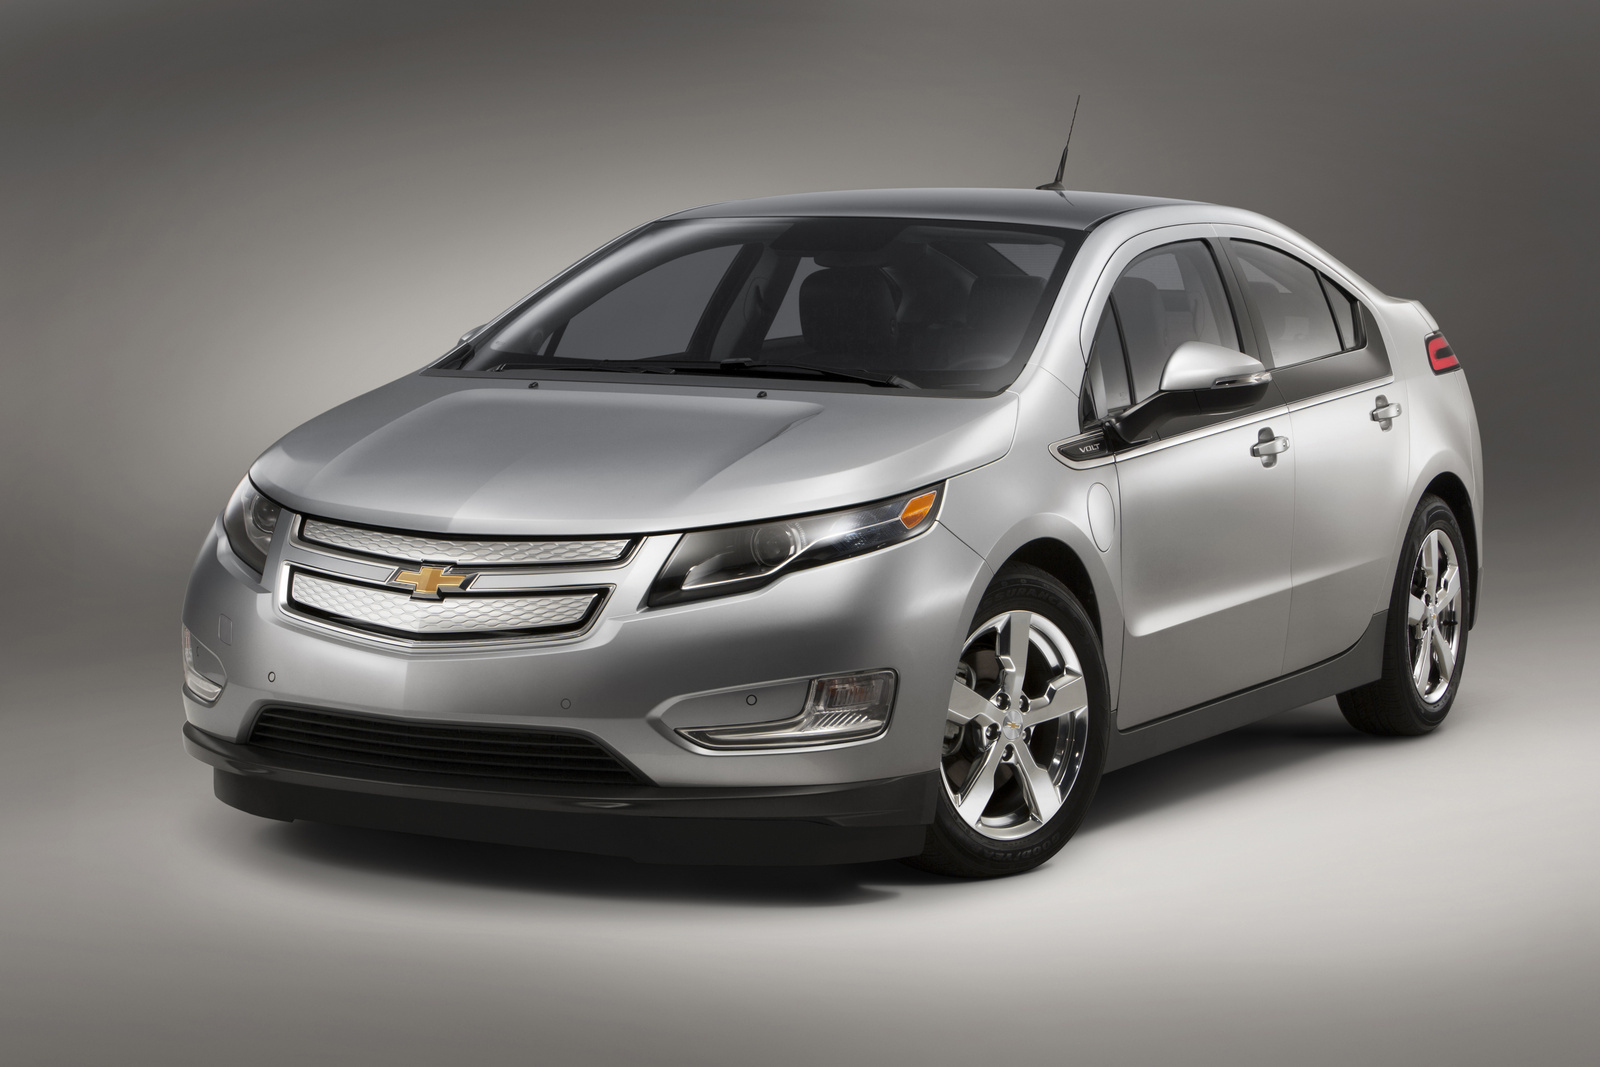 2014 Chevrolet Volt - Overview - CarGurus